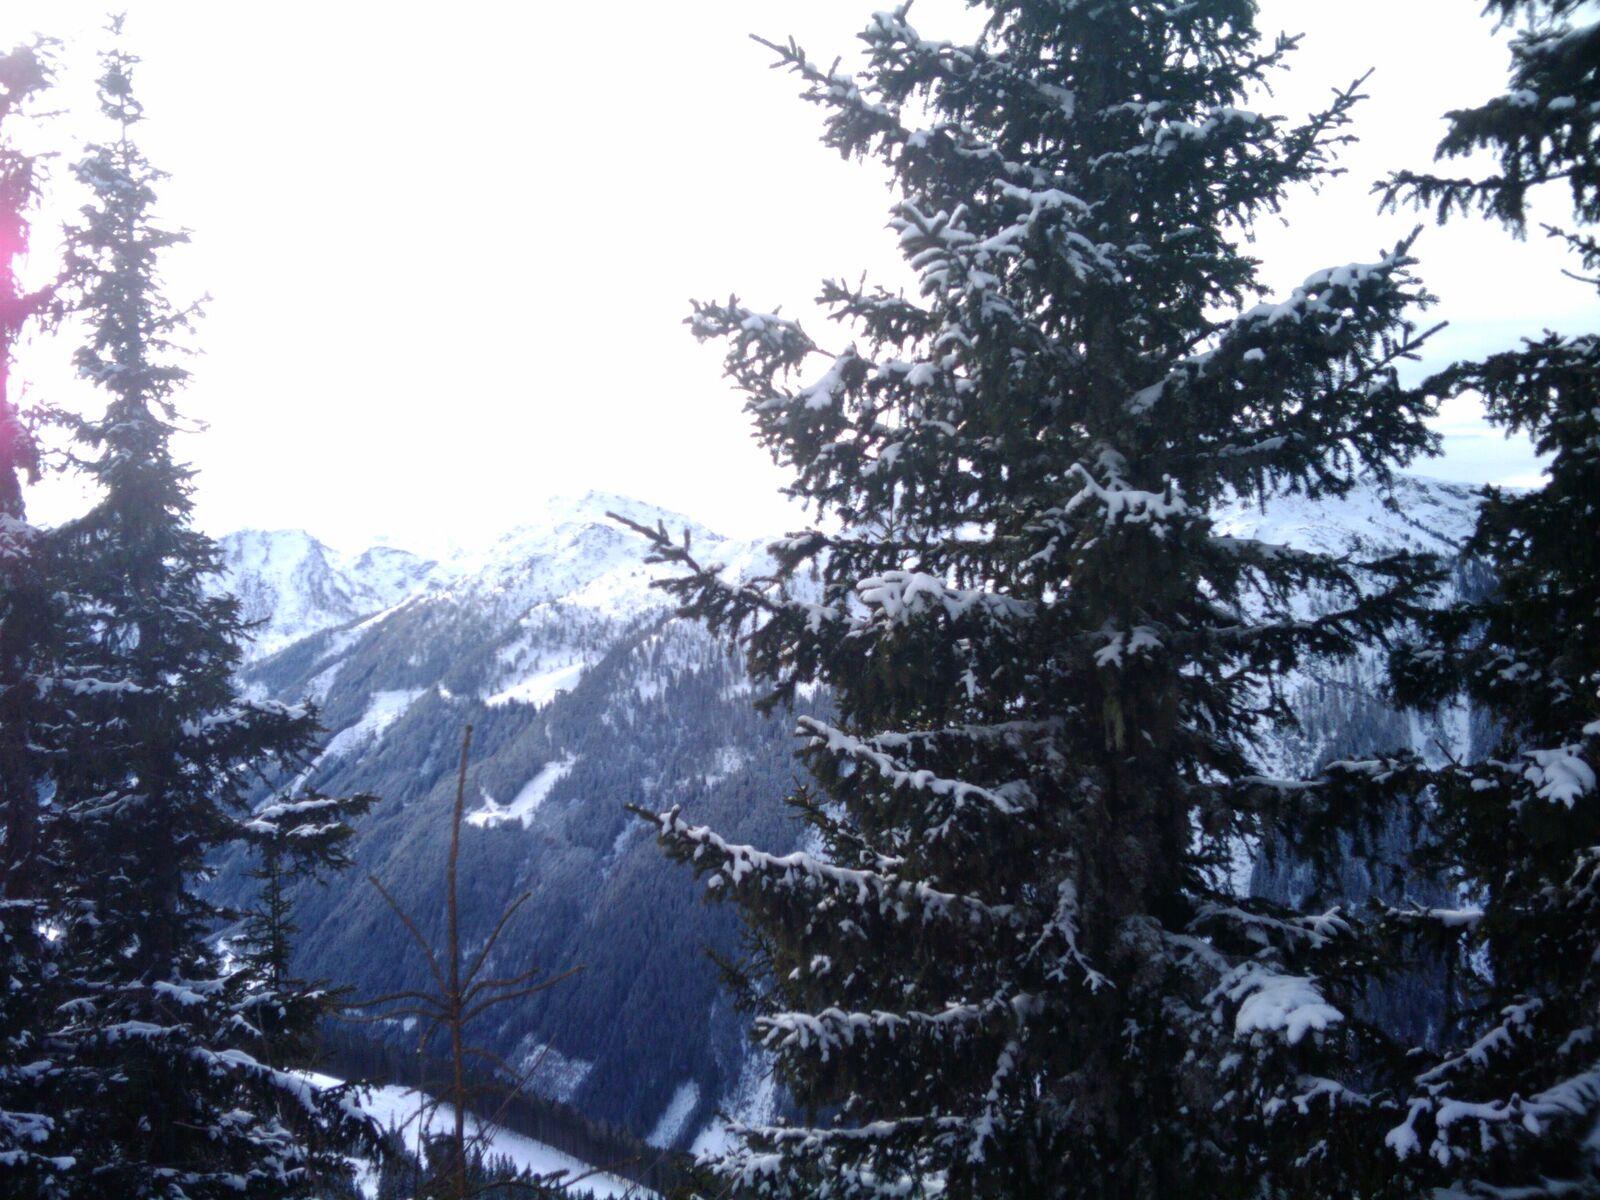 Clustering/images/winter6.jpeg